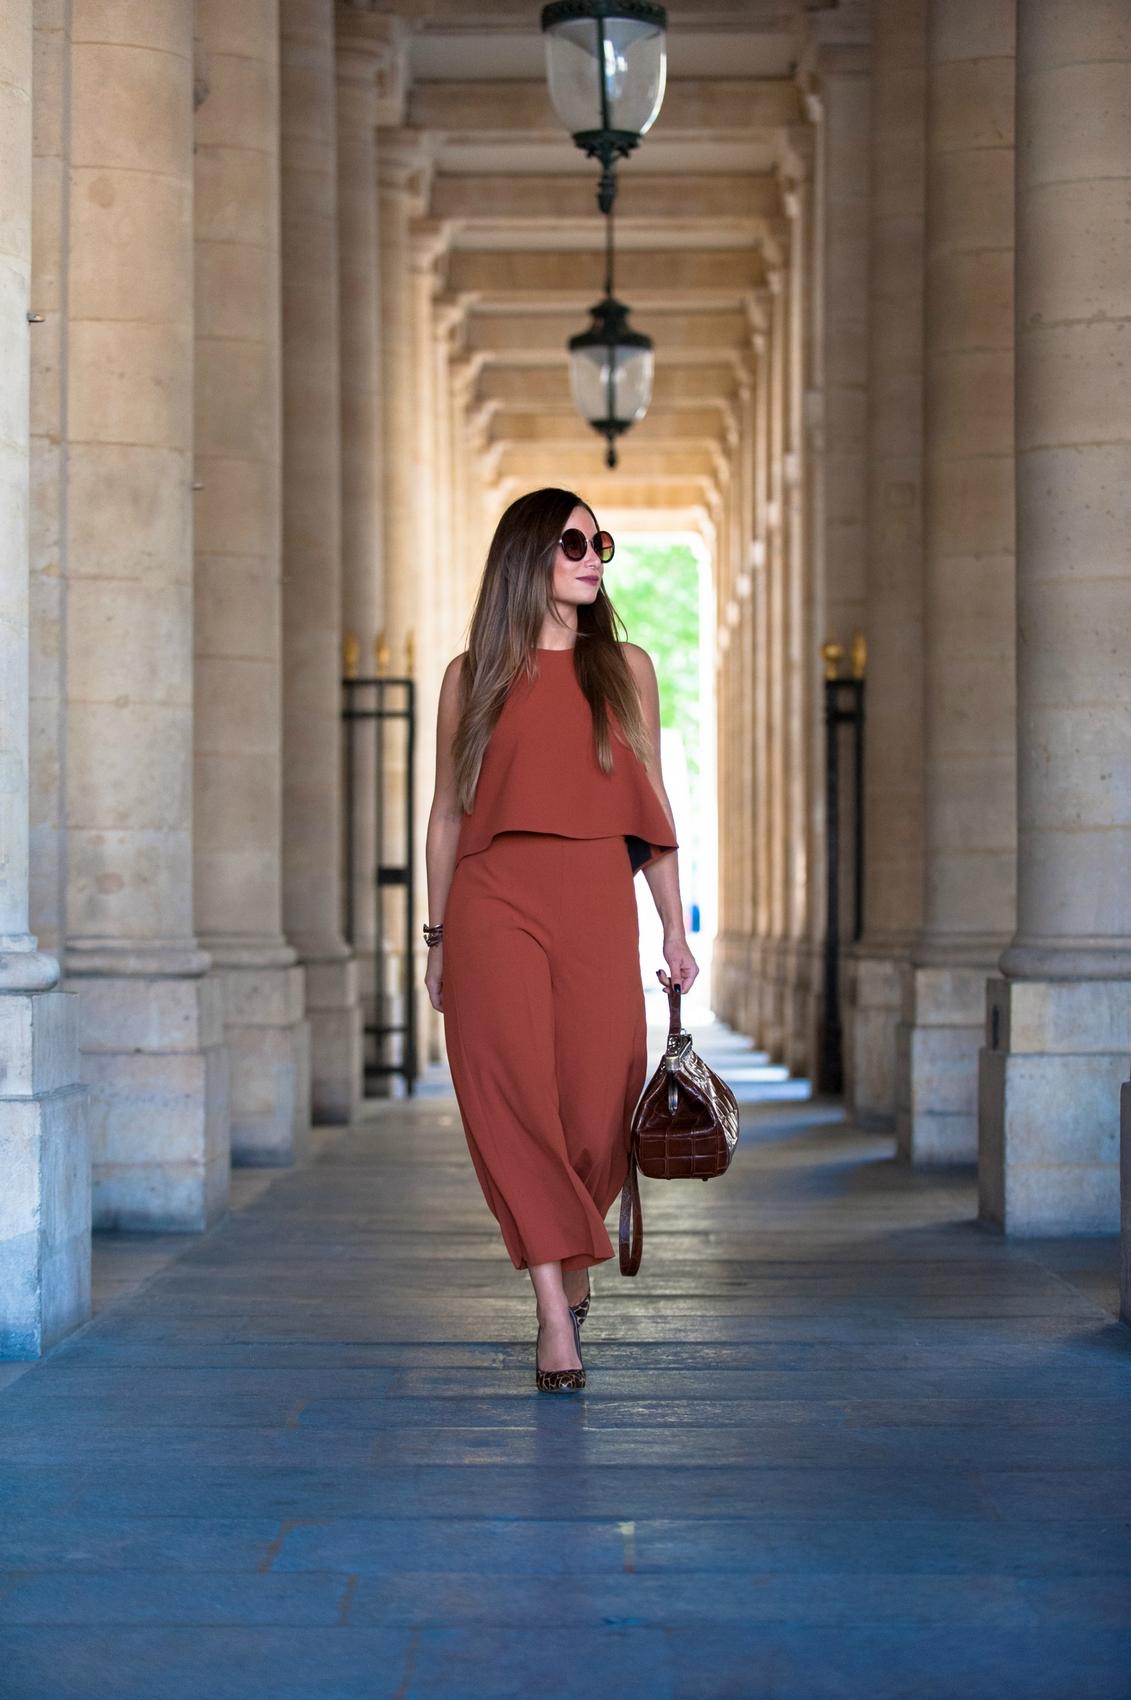 tendance pantalon jupe culotte blog mode